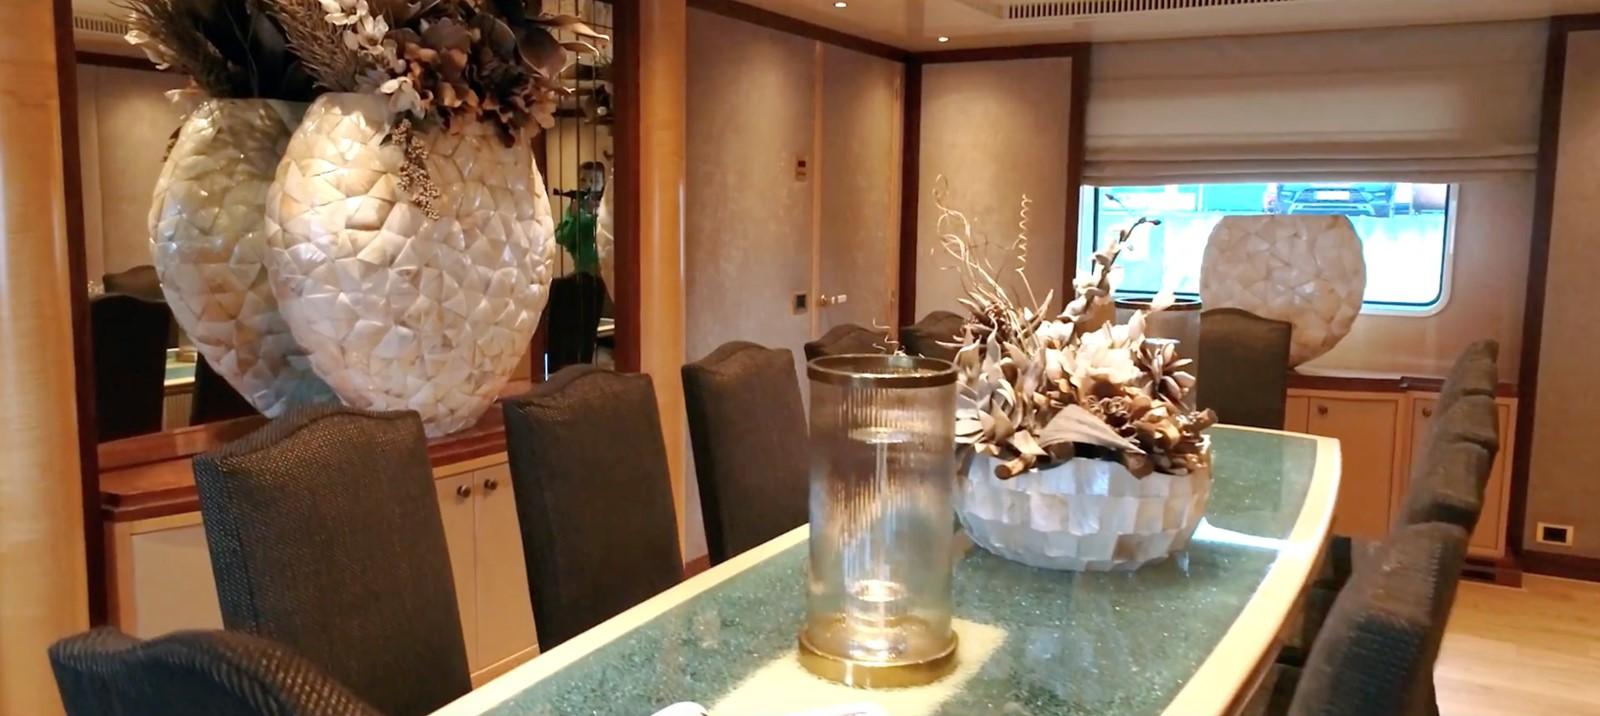 Dining Area - 162 OCEANCO For Sale